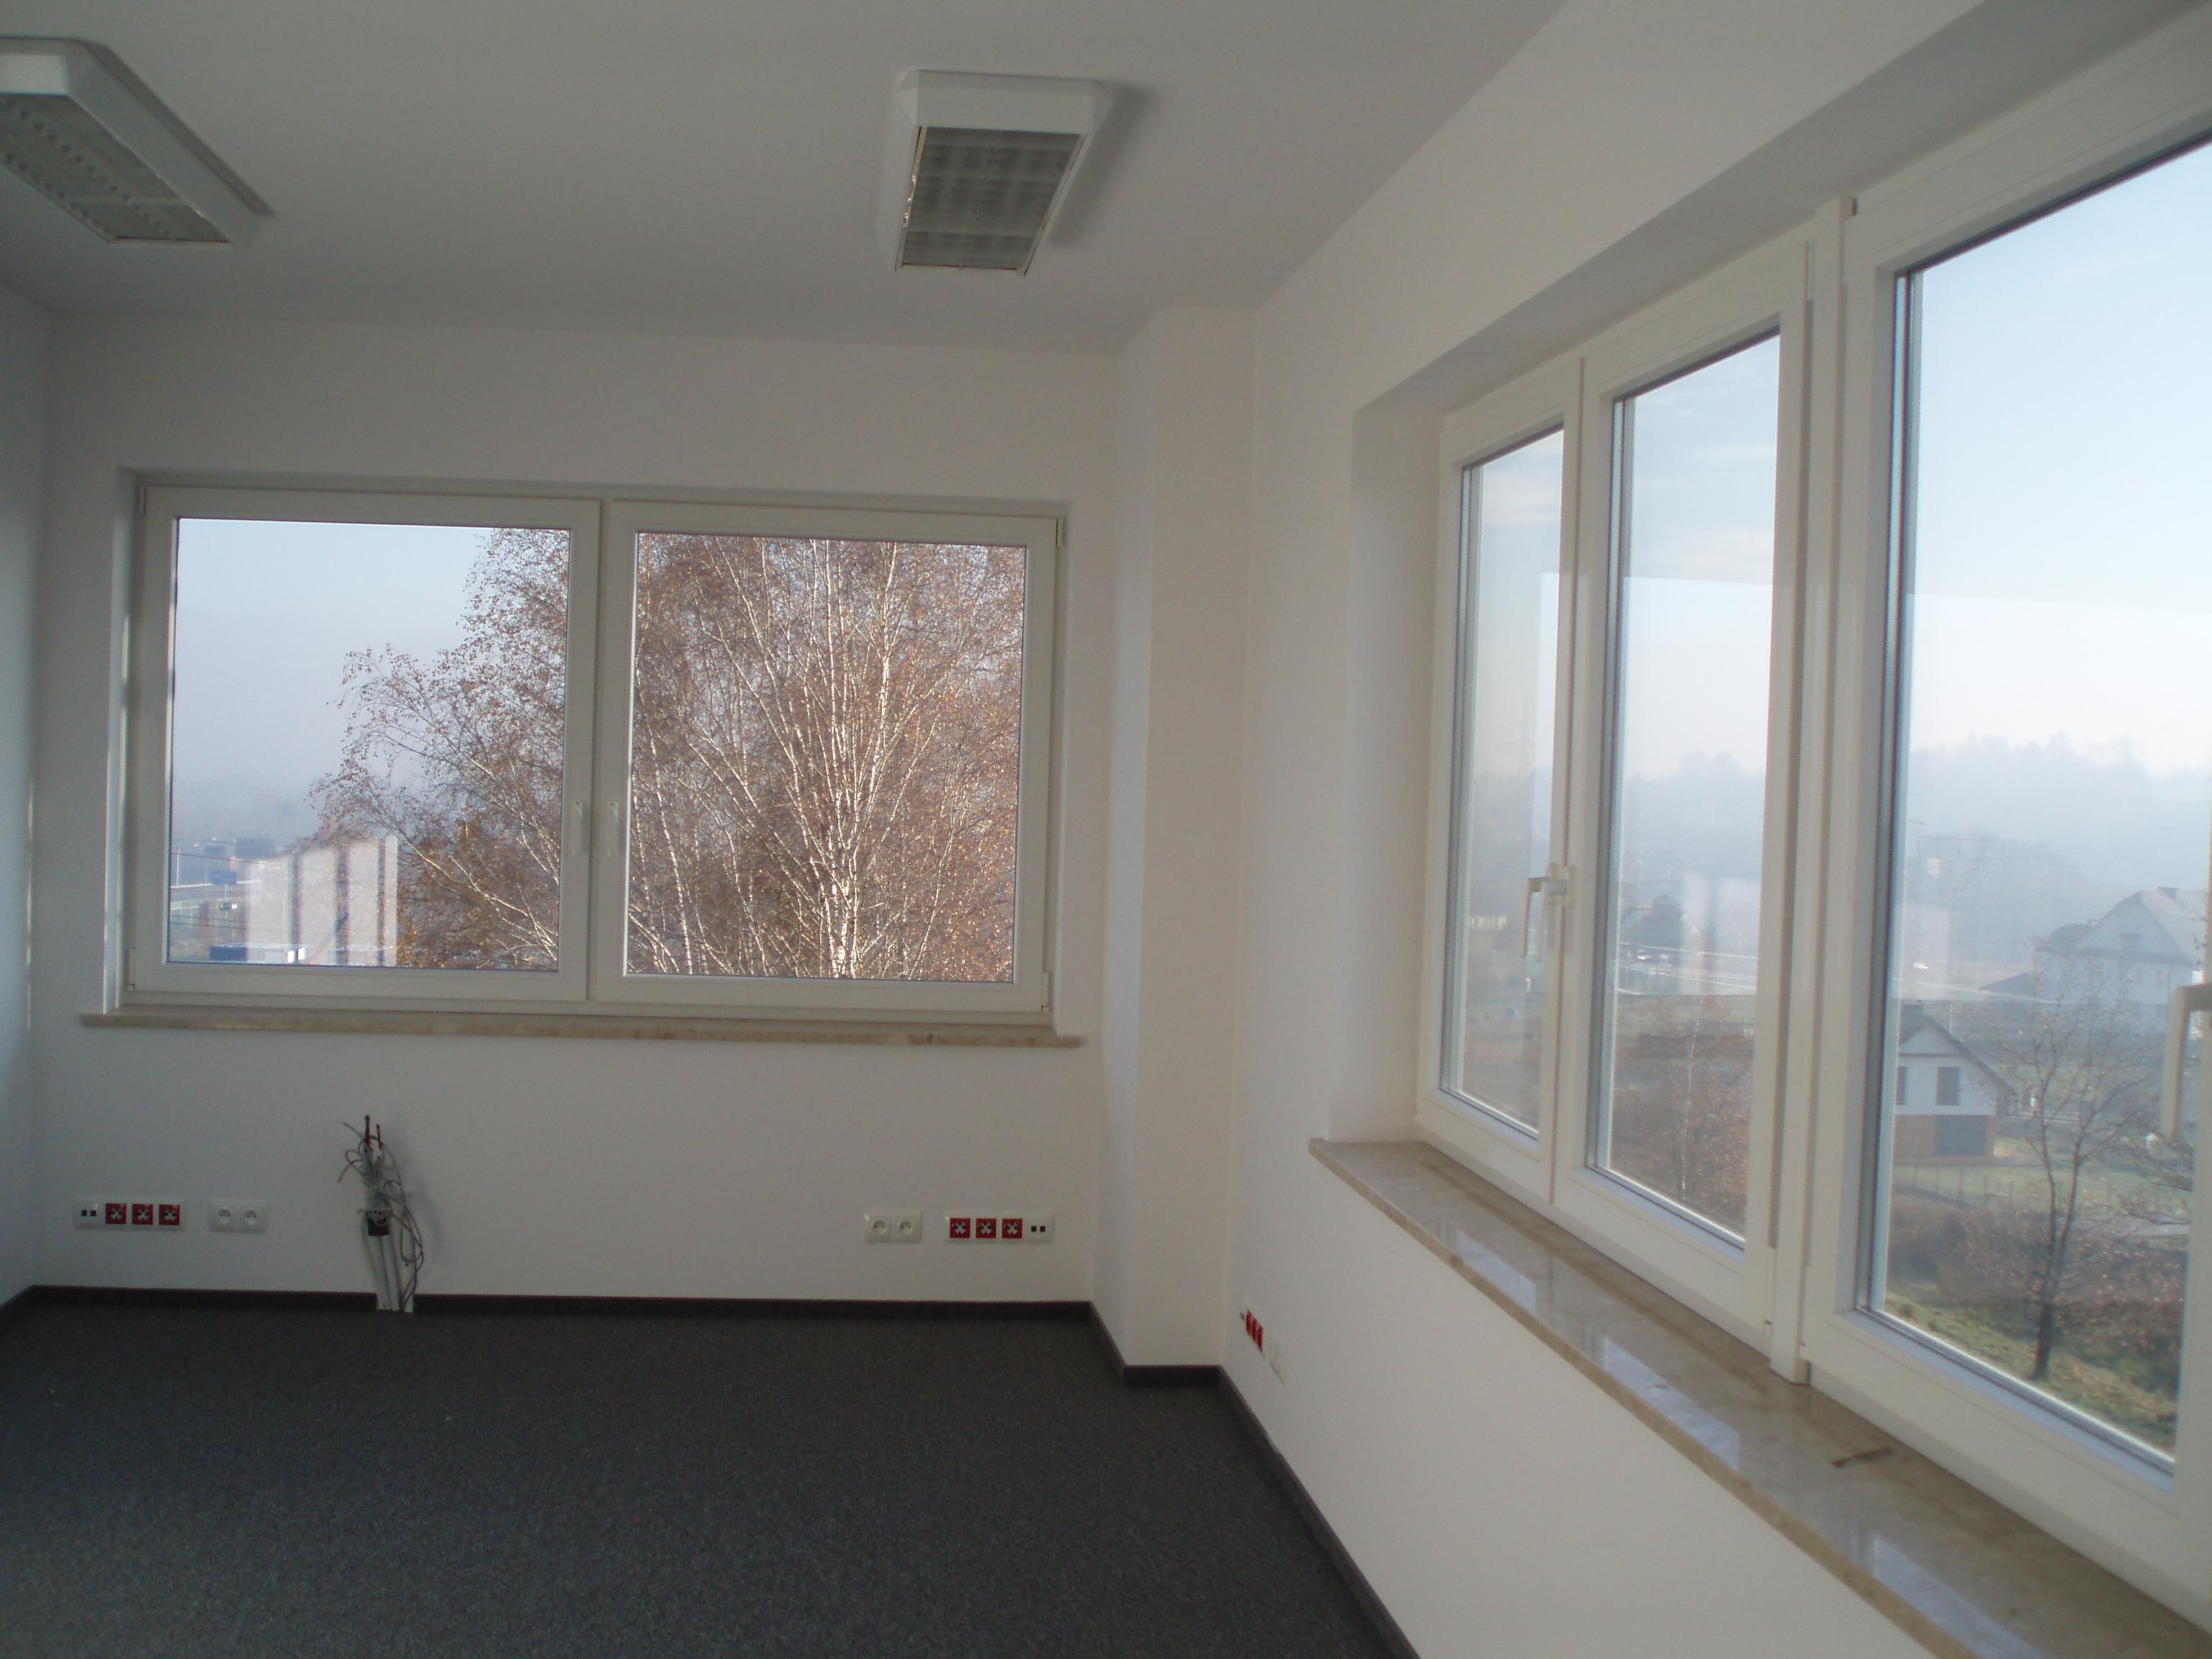 http://biznesparkwielicka.pl/uploads/images/biura/PB160257.JPG